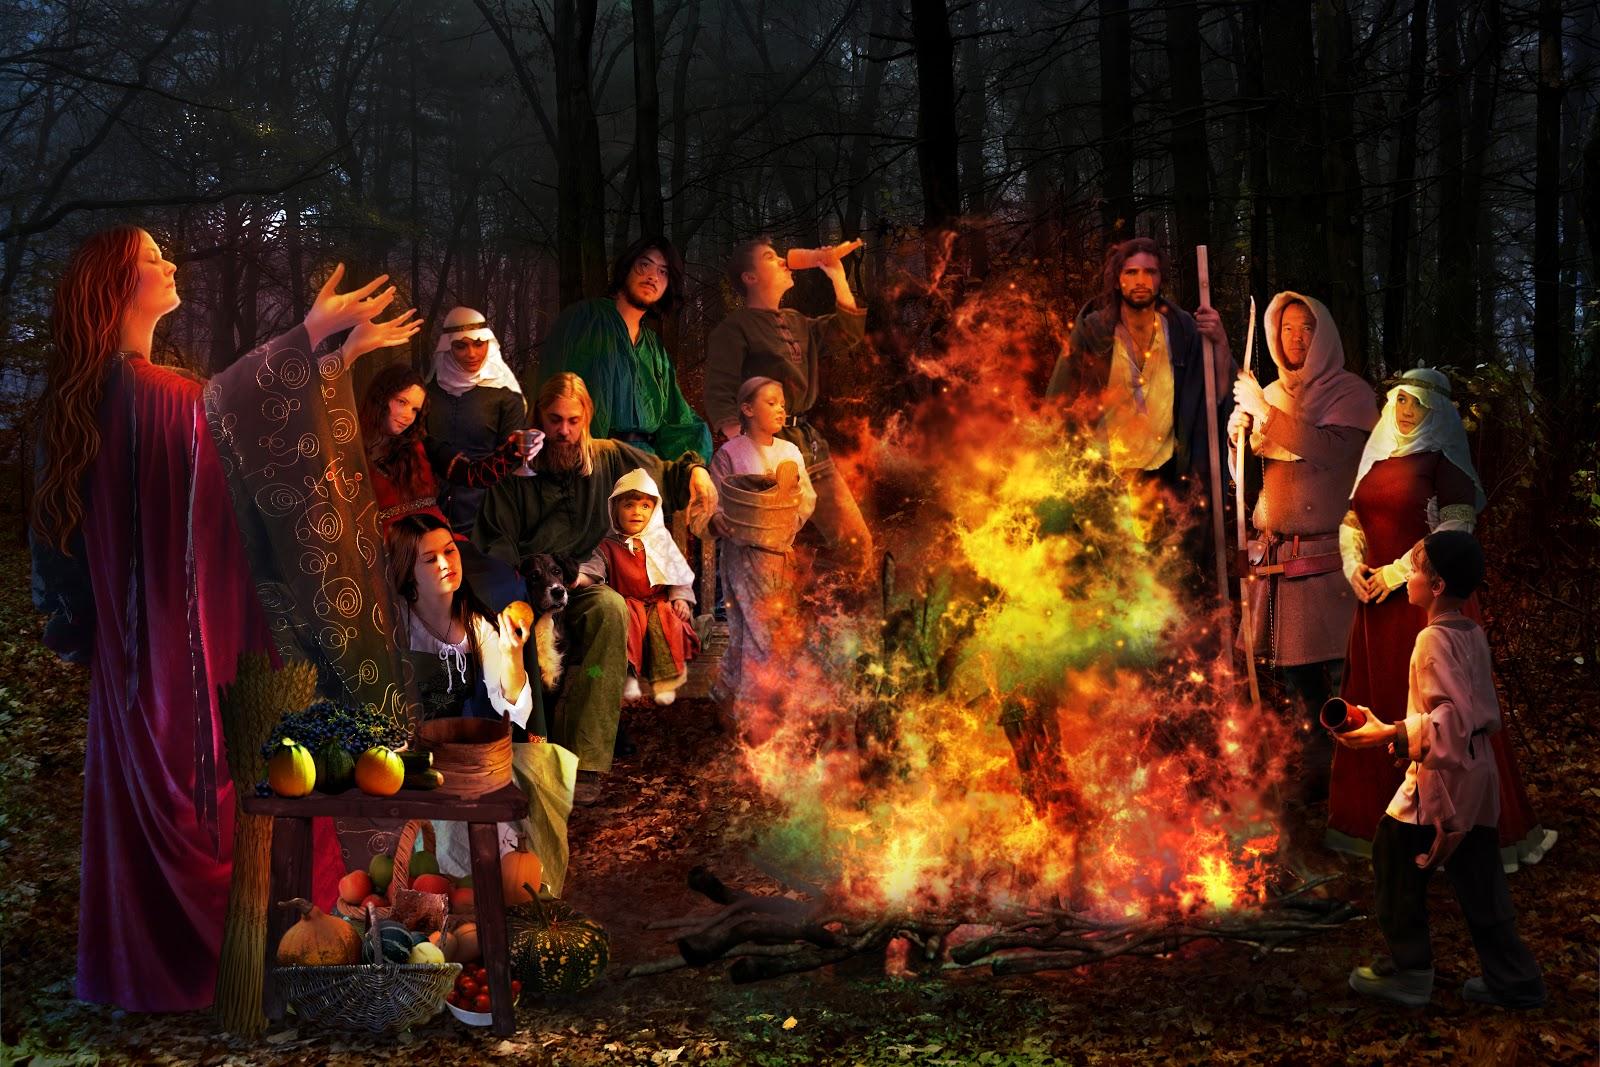 Samhain bonfire    by Maree Jamieson